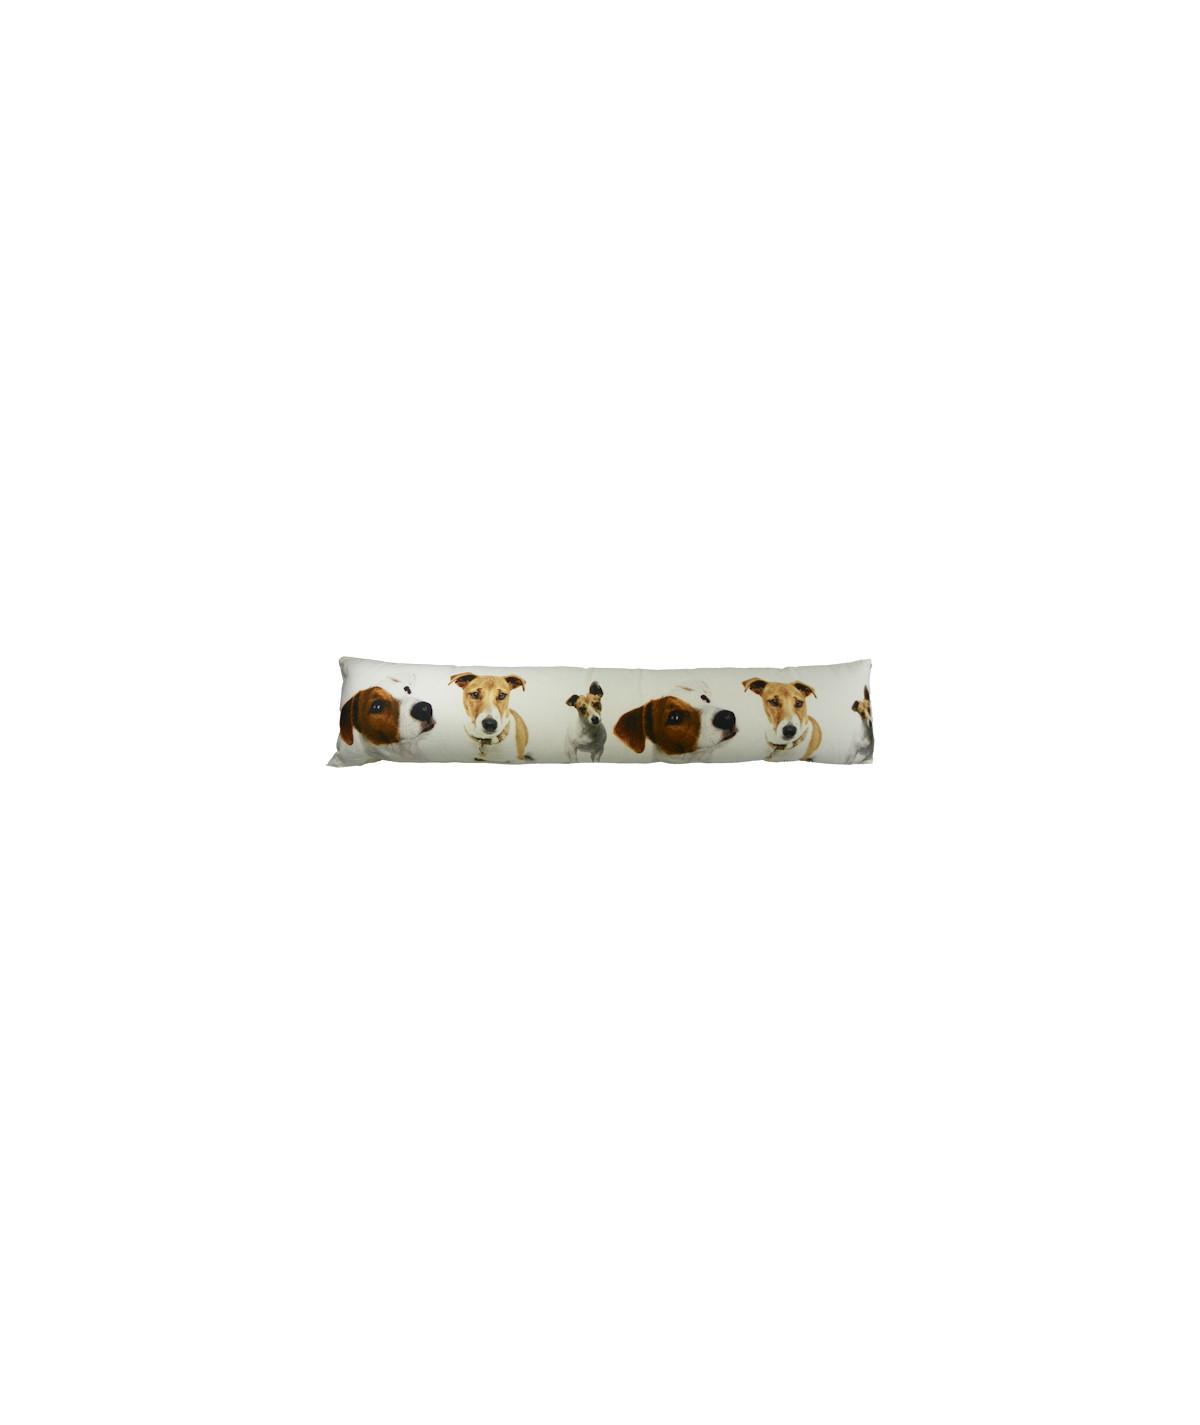 Boudin de porte en toile de coton 90x20cm - Jack Russell |YESDEKO